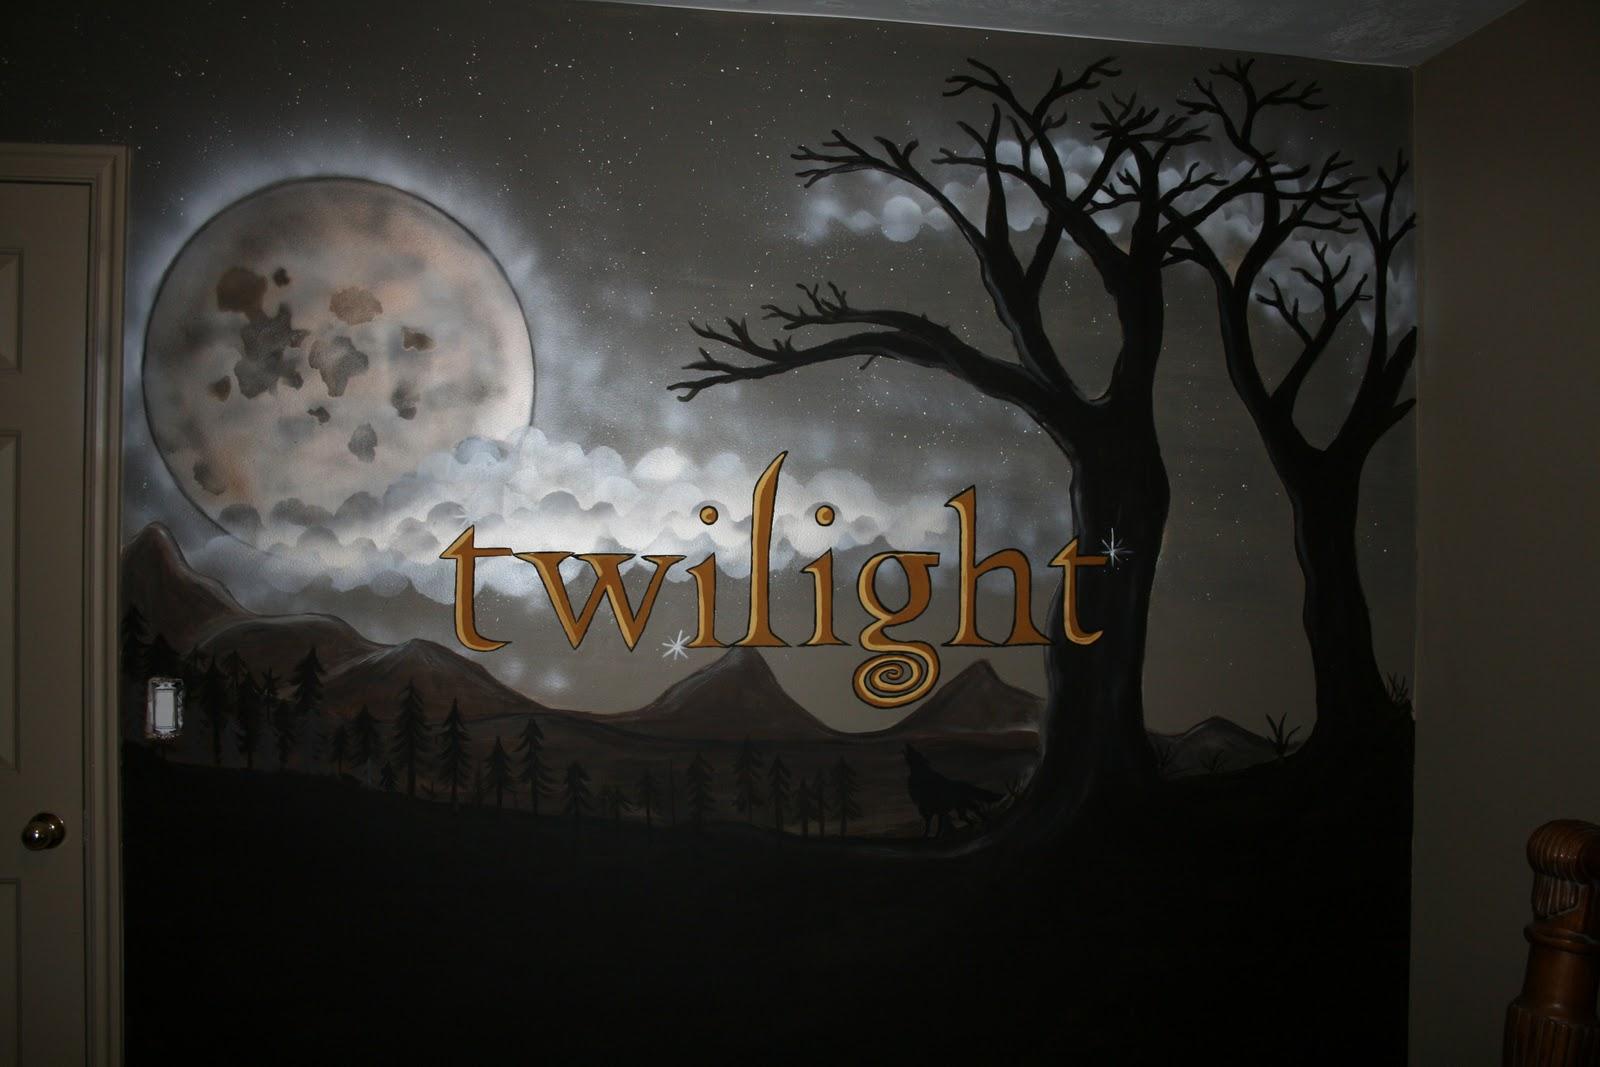 Movie Themed Bedroom Artistic Murals Twilight Theme Mural